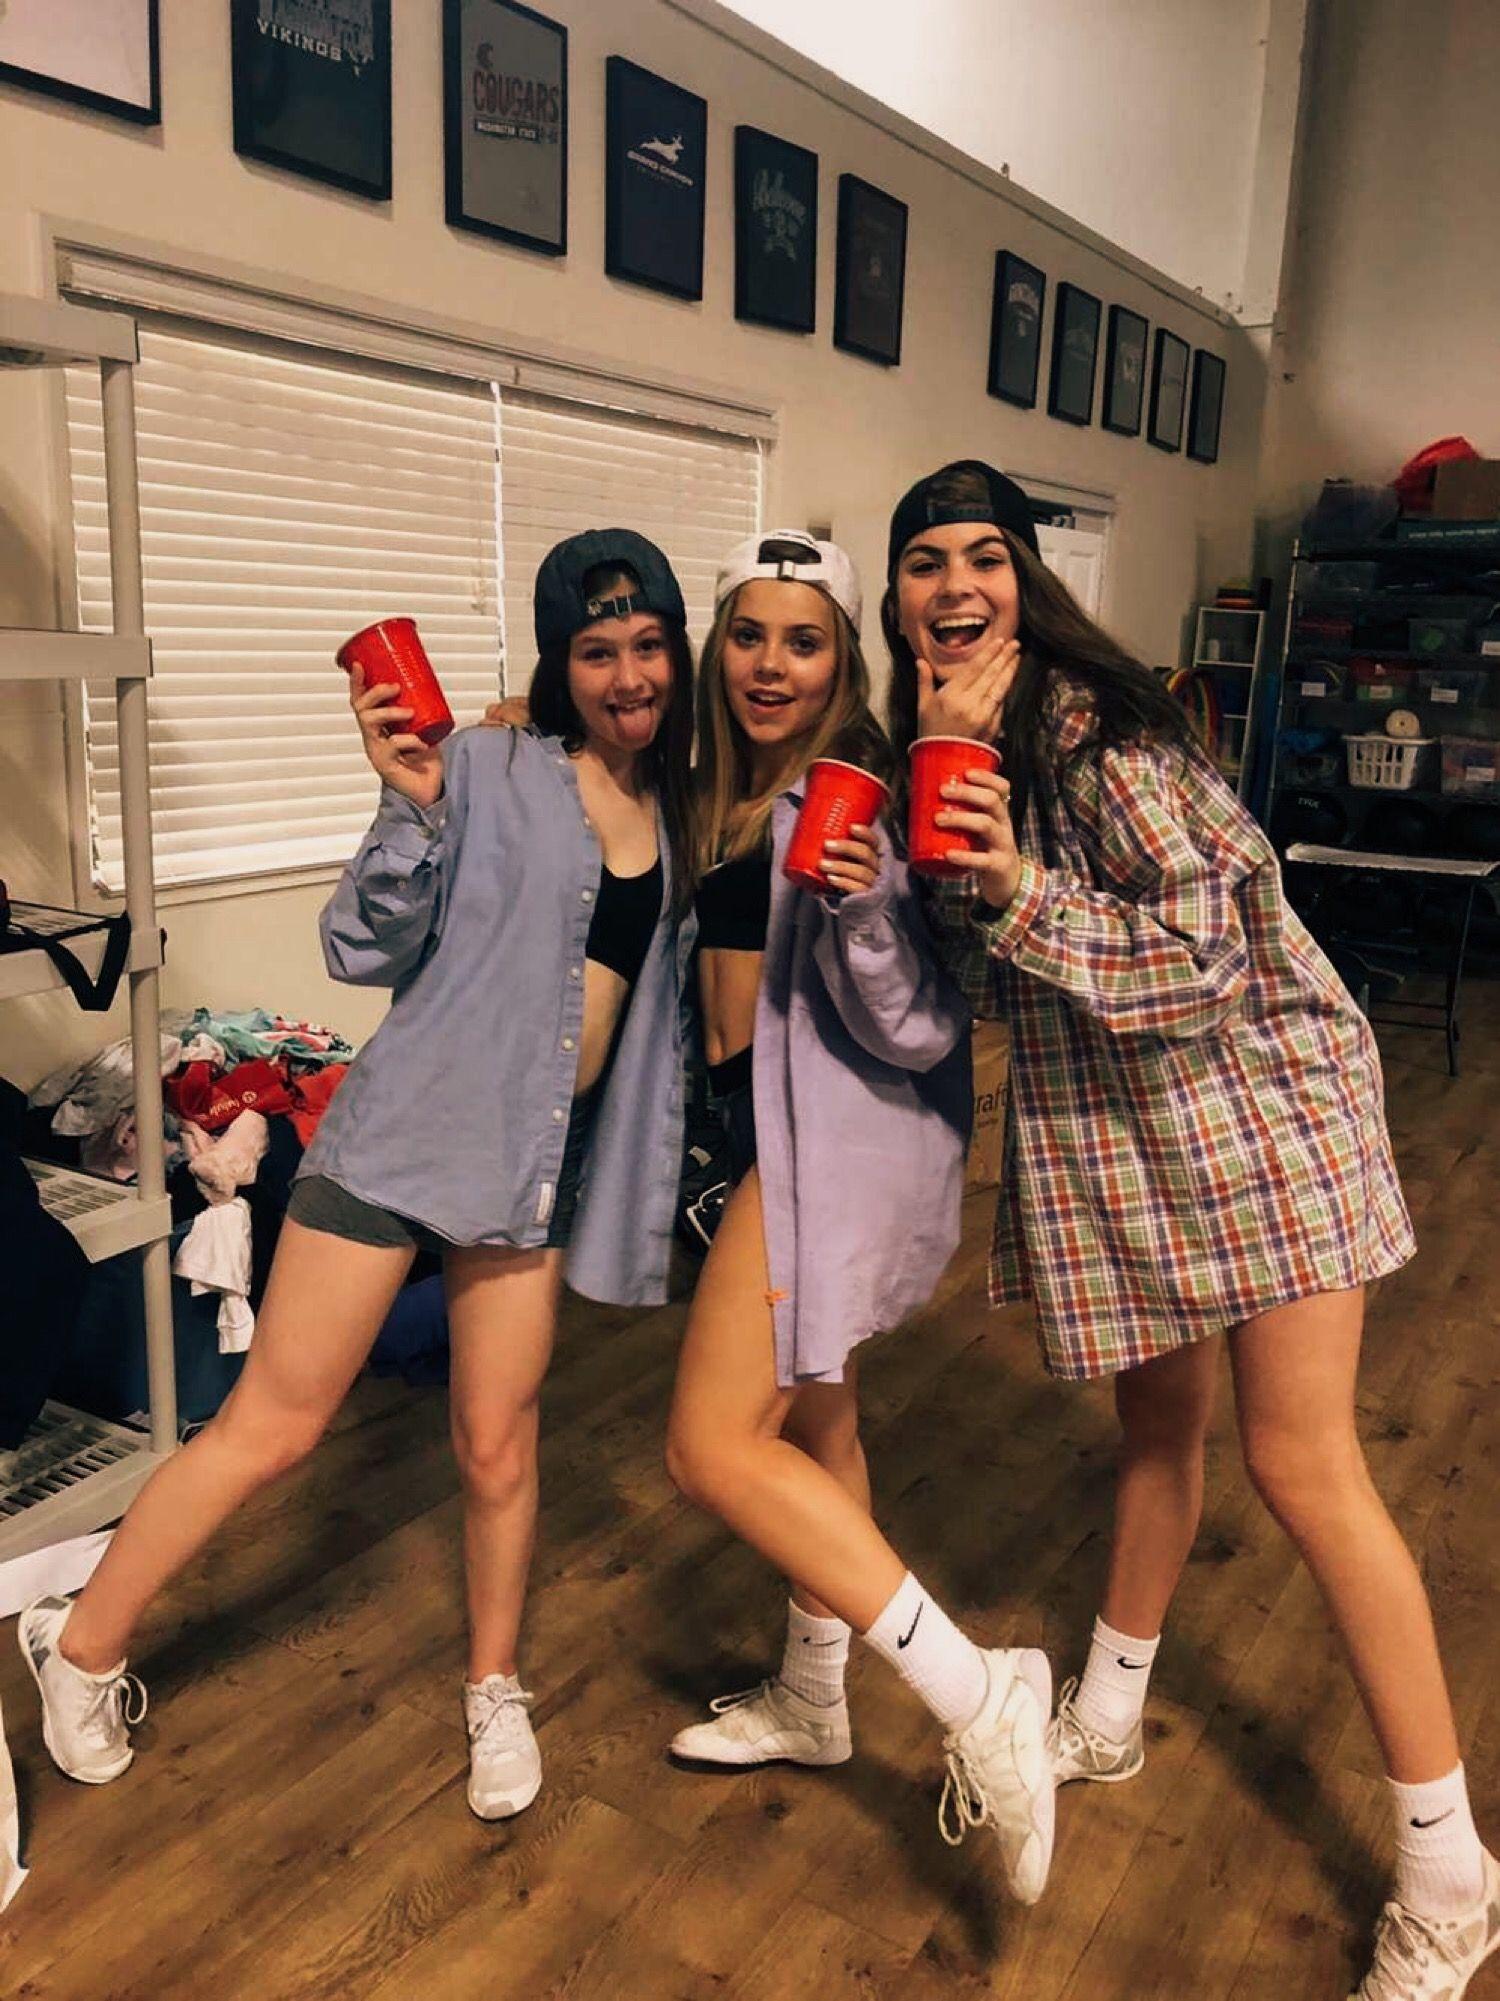 Best Frat Halloween Costumes 2020 frat boy costume idea in 2020 | Trio halloween costumes, Halloween